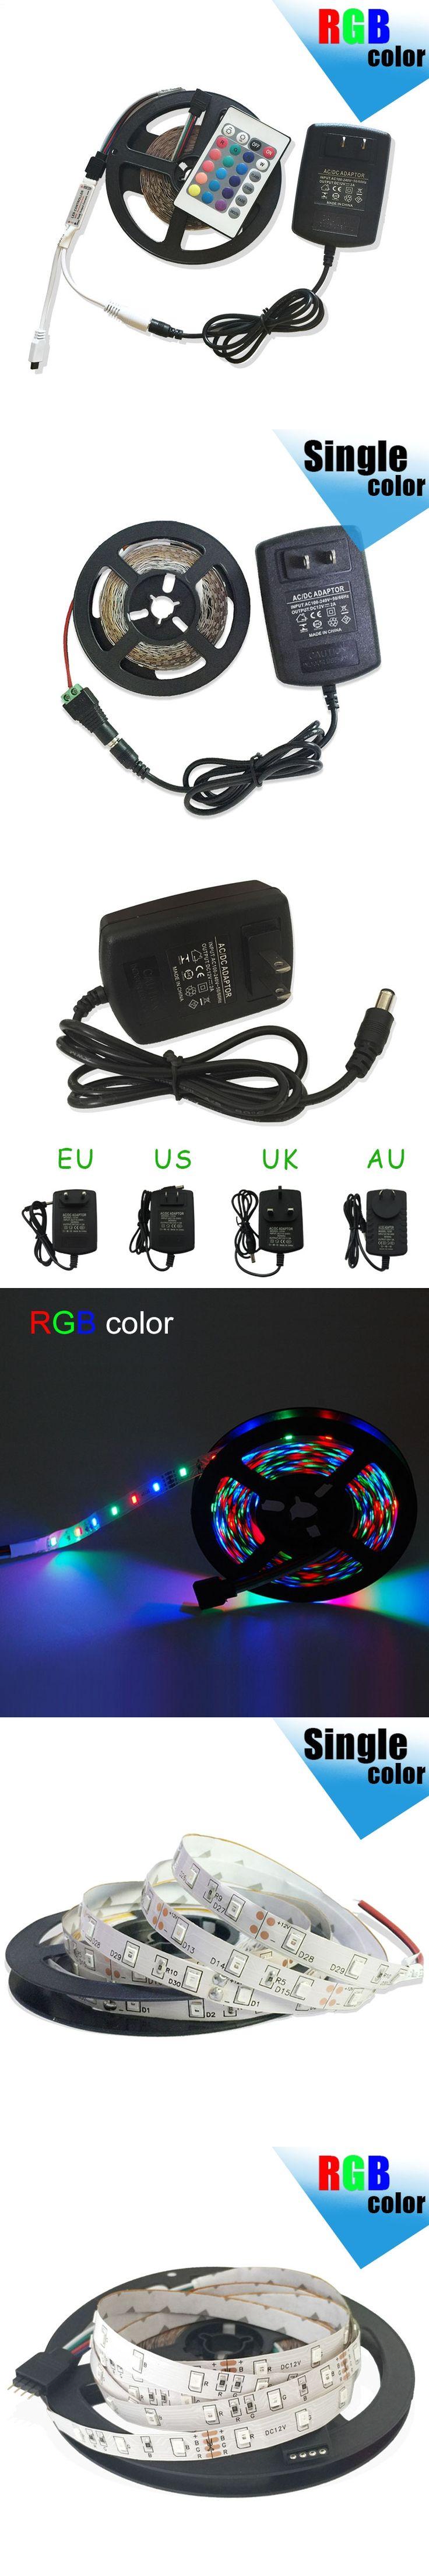 Waterproof LED Strip 300leds/5M 3528 LED Lights SMD RGB Lights IP20/IP65 LED Ribbon Tape set+RGB Controller+12V 2A Power Supply